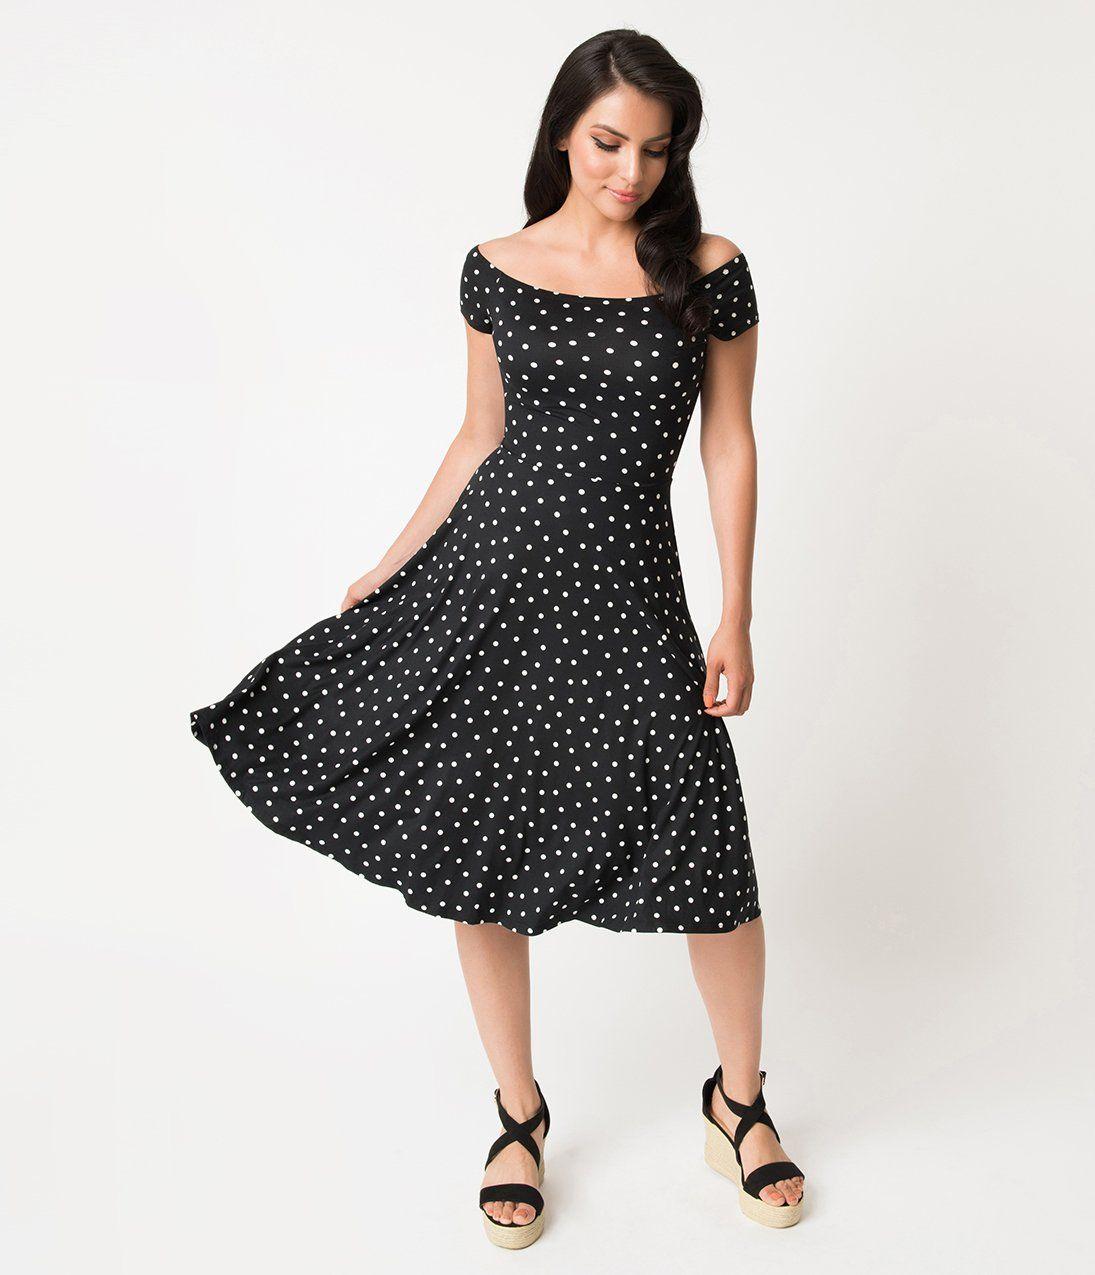 bc663775b3652 Retro Style Black & White Polka Dot Off Shoulder Swing Dress – Unique  Vintage